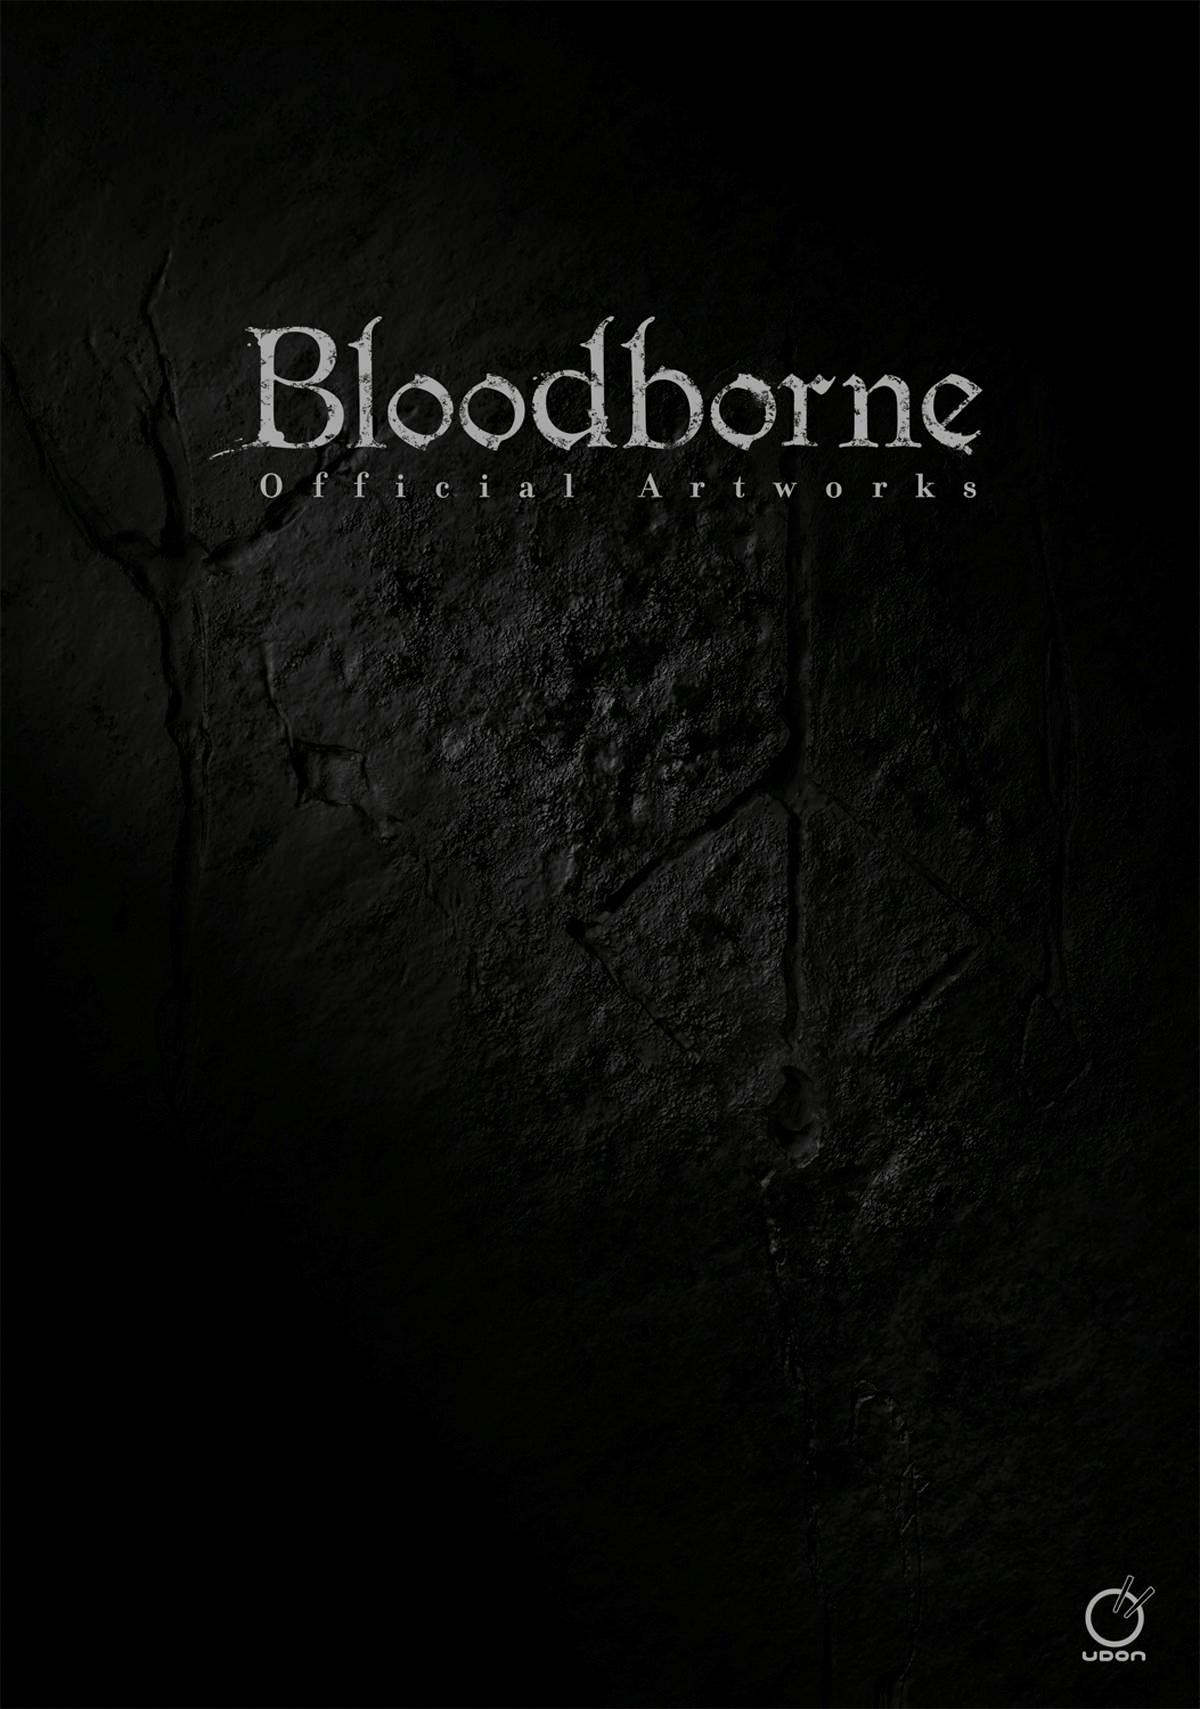 Portada libro - Artbook oficial Bloodborne